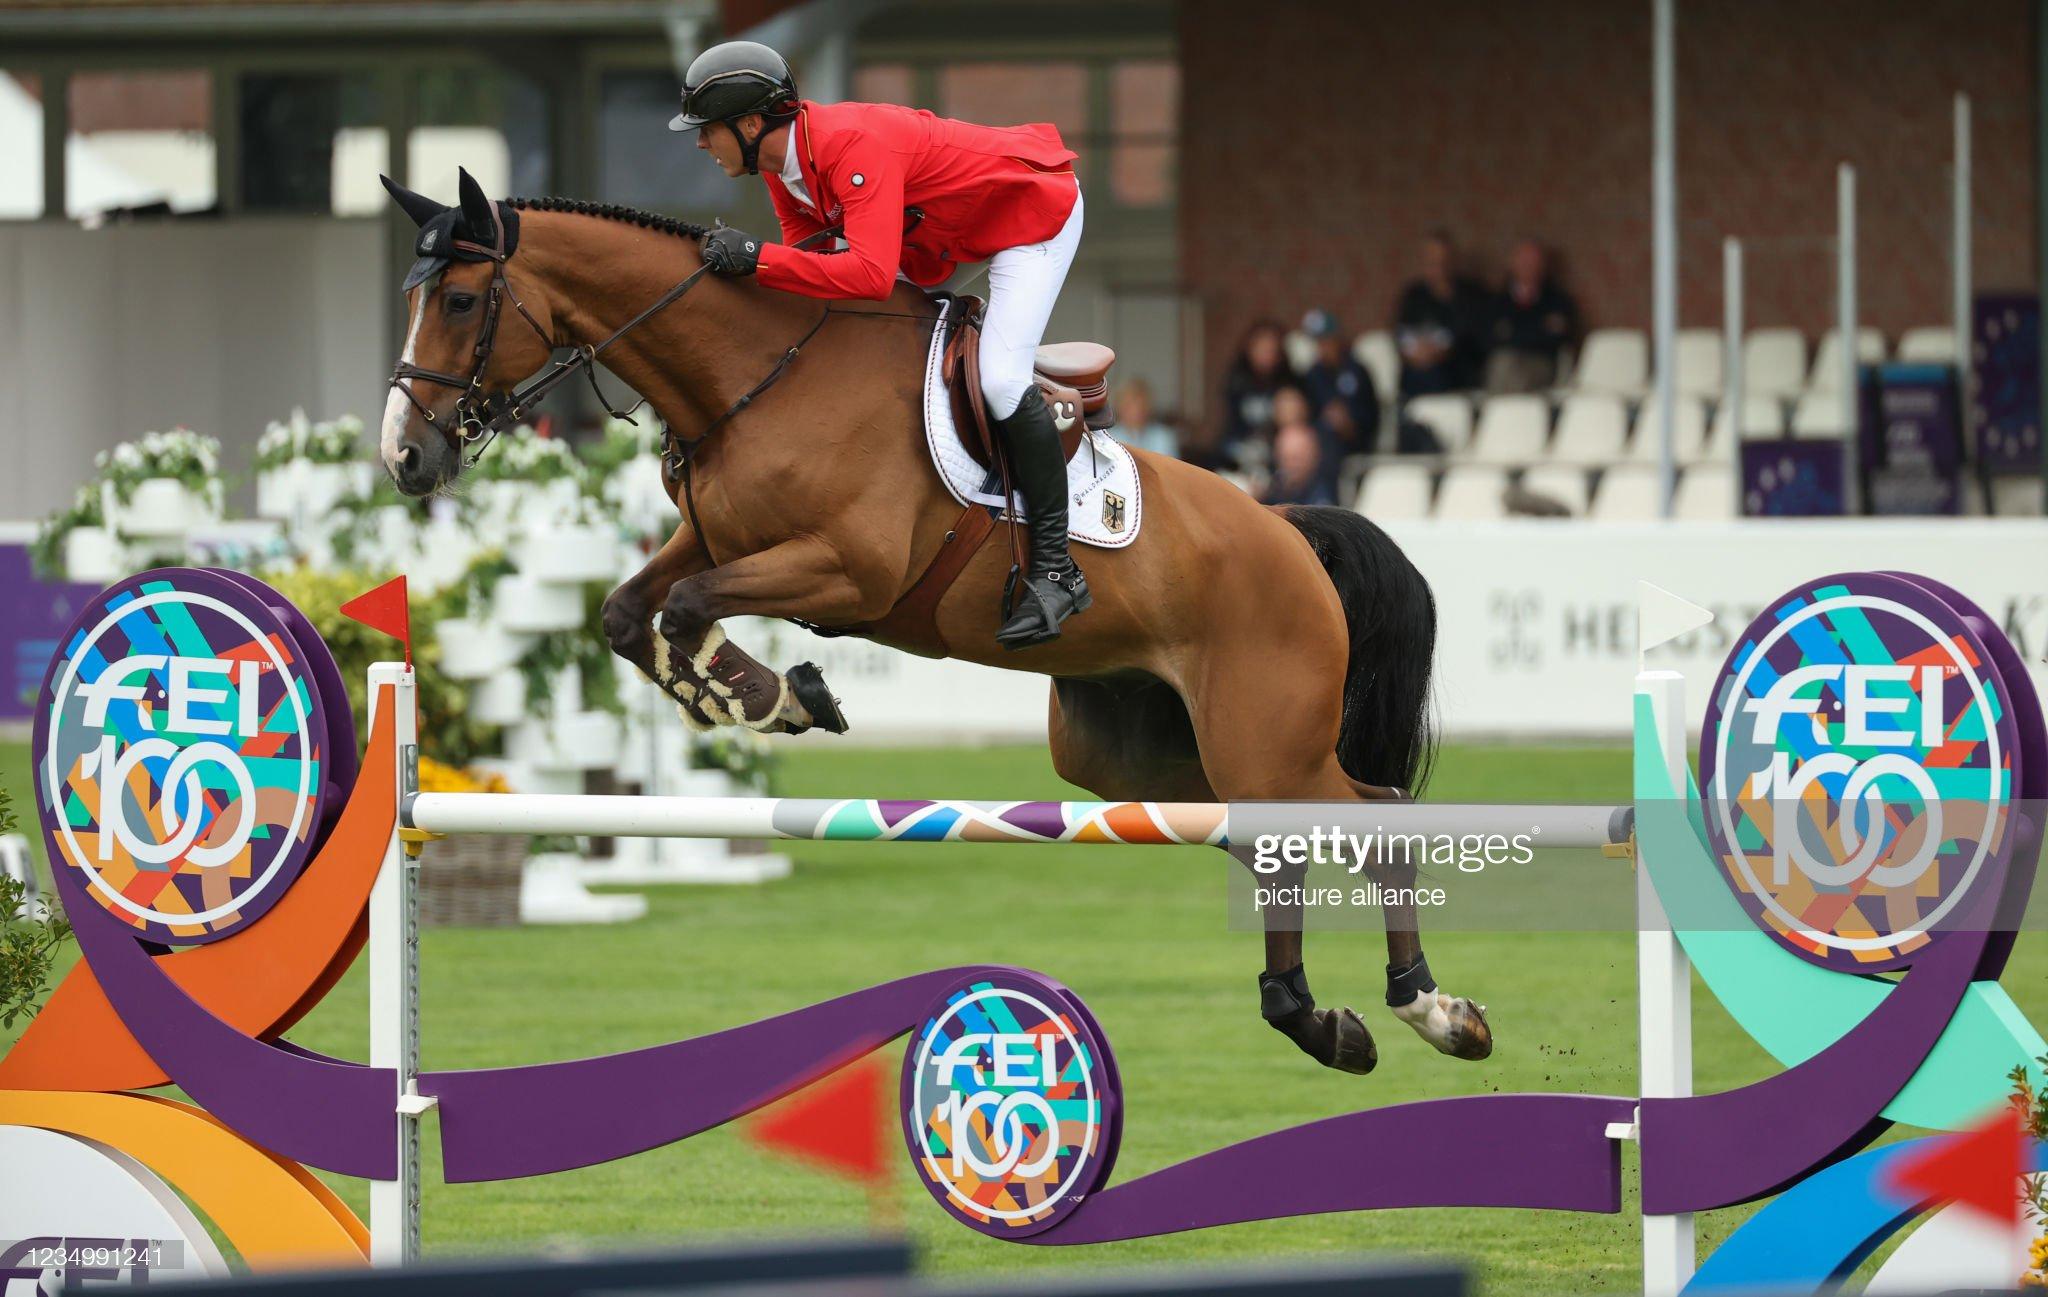 Show Jumping - European Championship : Fotografía de noticias